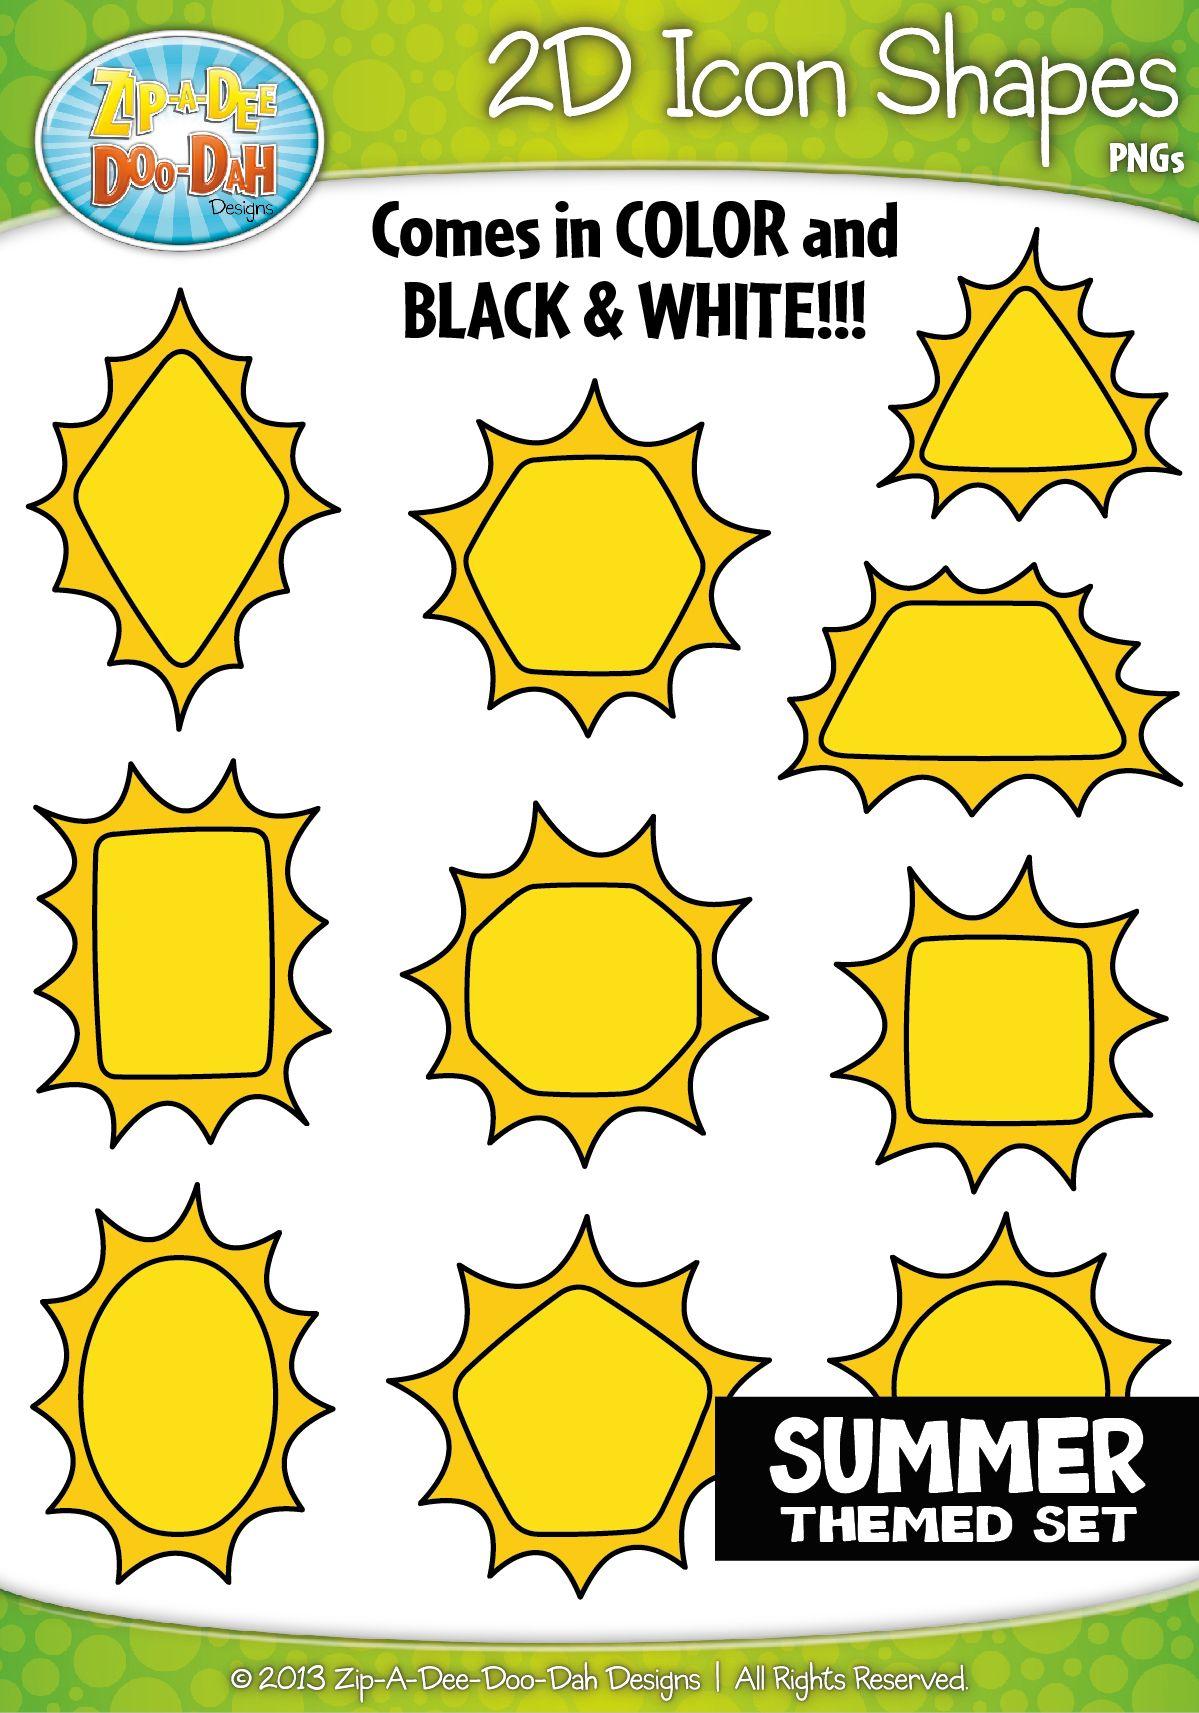 Summer 2d Icon Shapes Clipart Zip A Dee Doo Dah Designs Shapes Clip Art Learning Shapes [ 1713 x 1199 Pixel ]